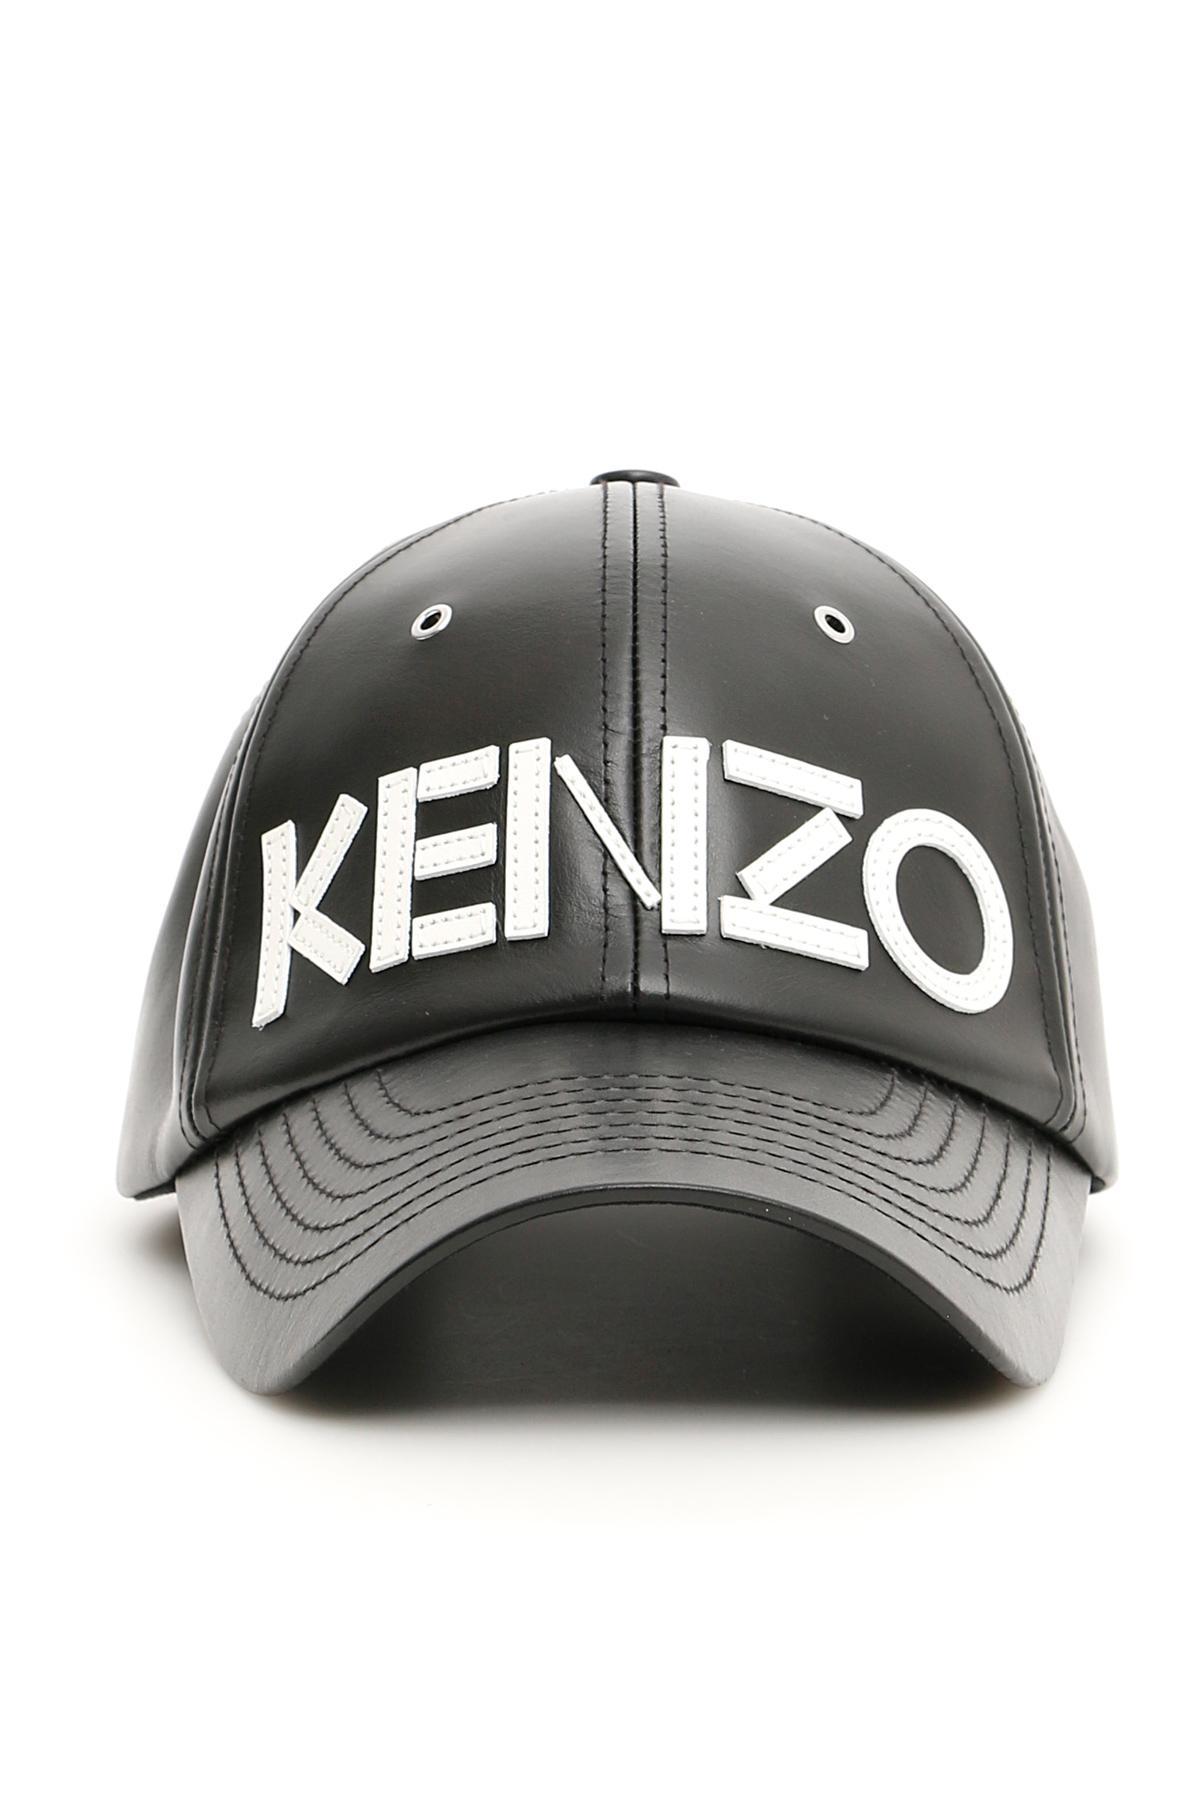 beccce0e11301 Kenzo Men s Fashion price in Malaysia - Best Kenzo Men s Fashion ...